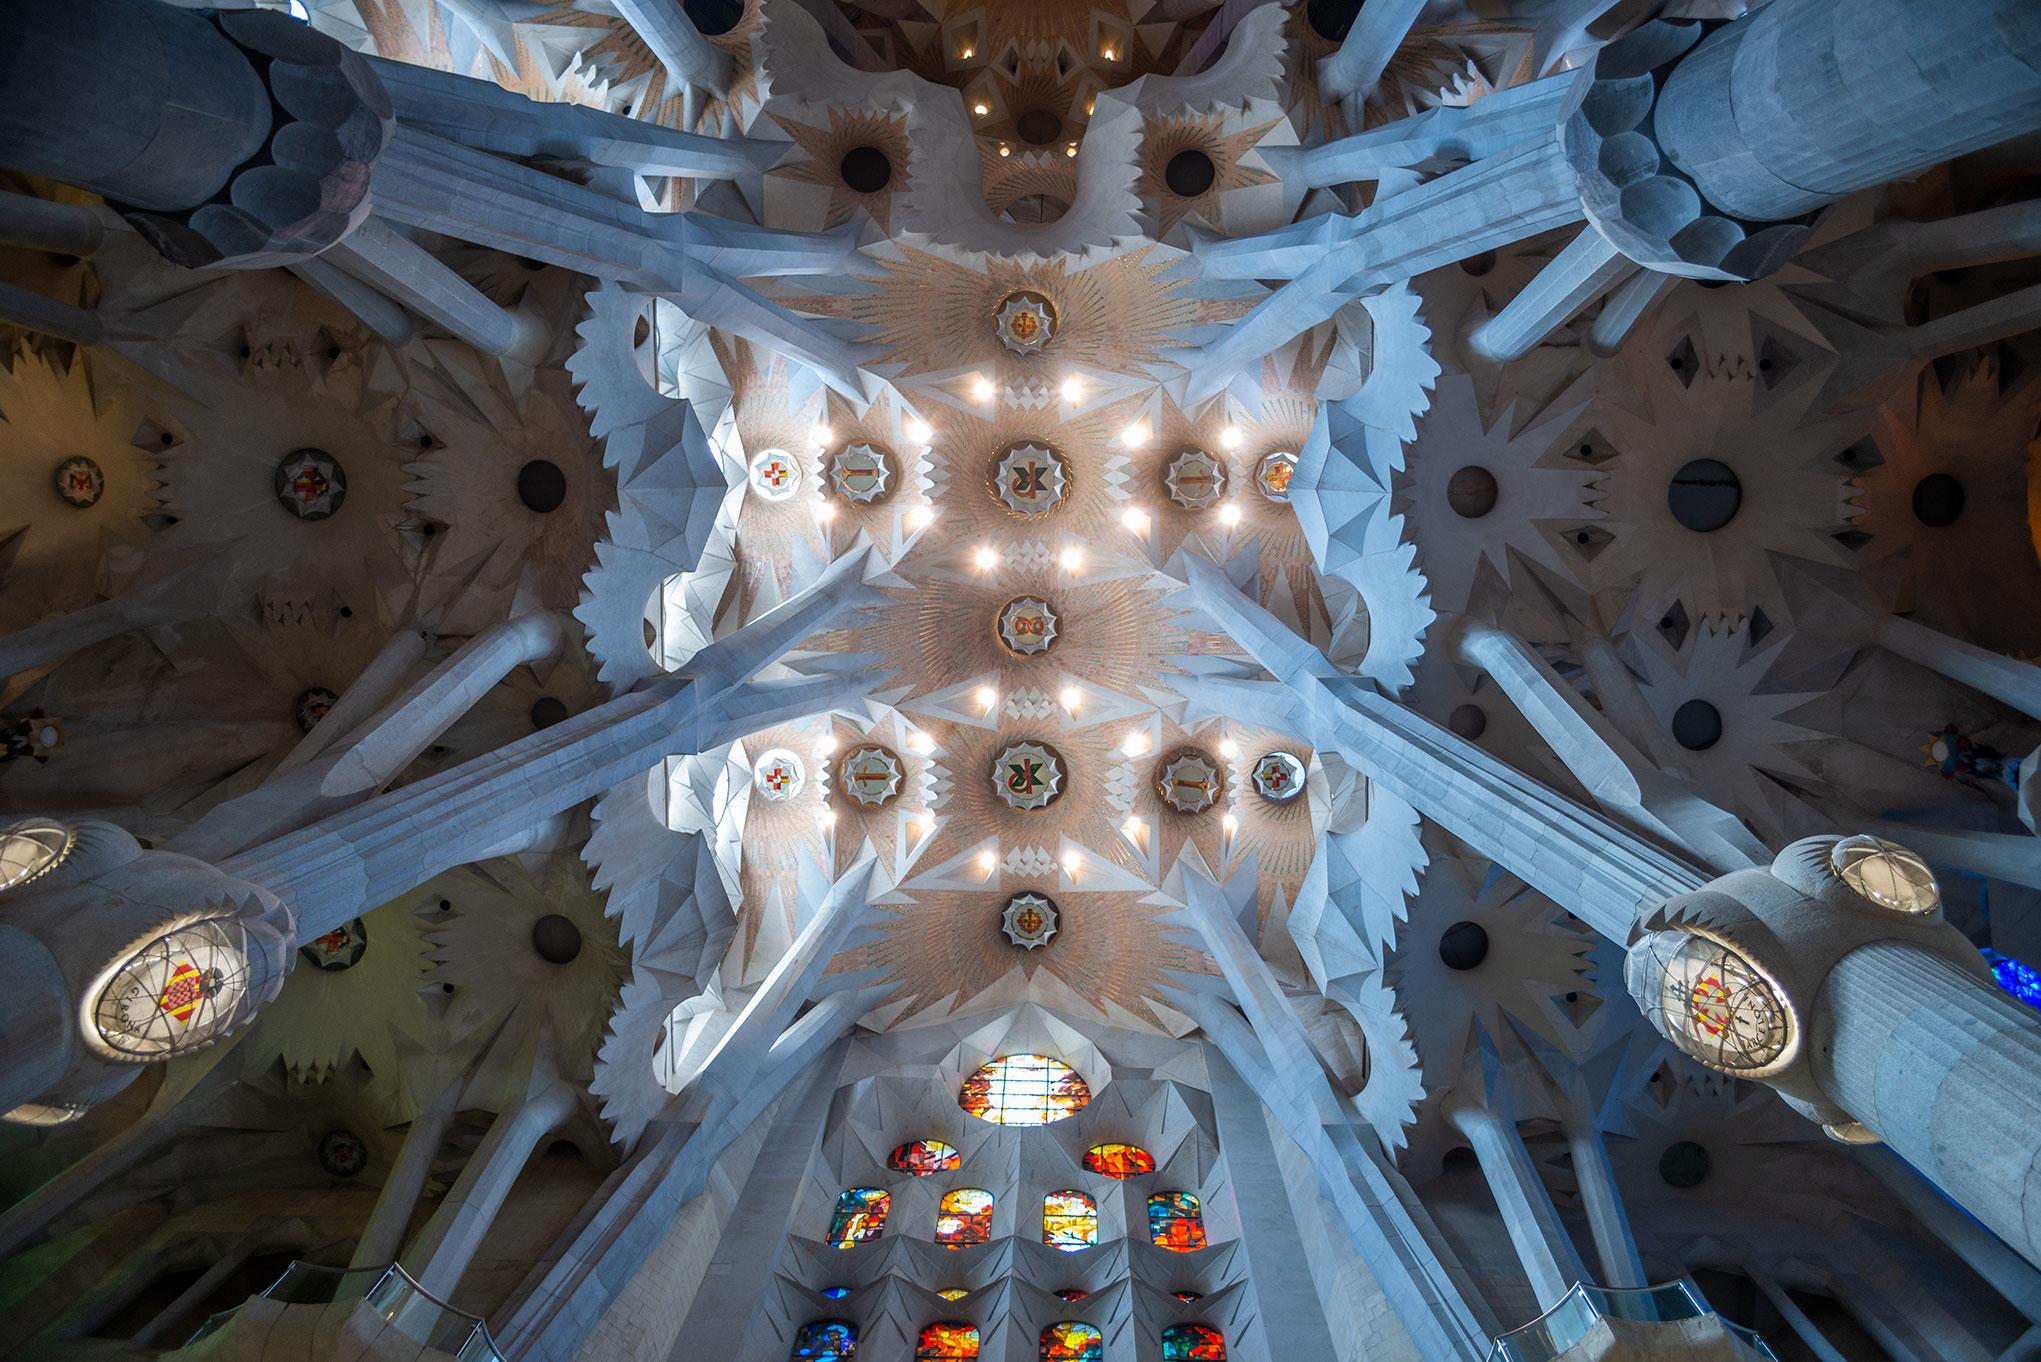 Sagrada ceiling view, Barcelona